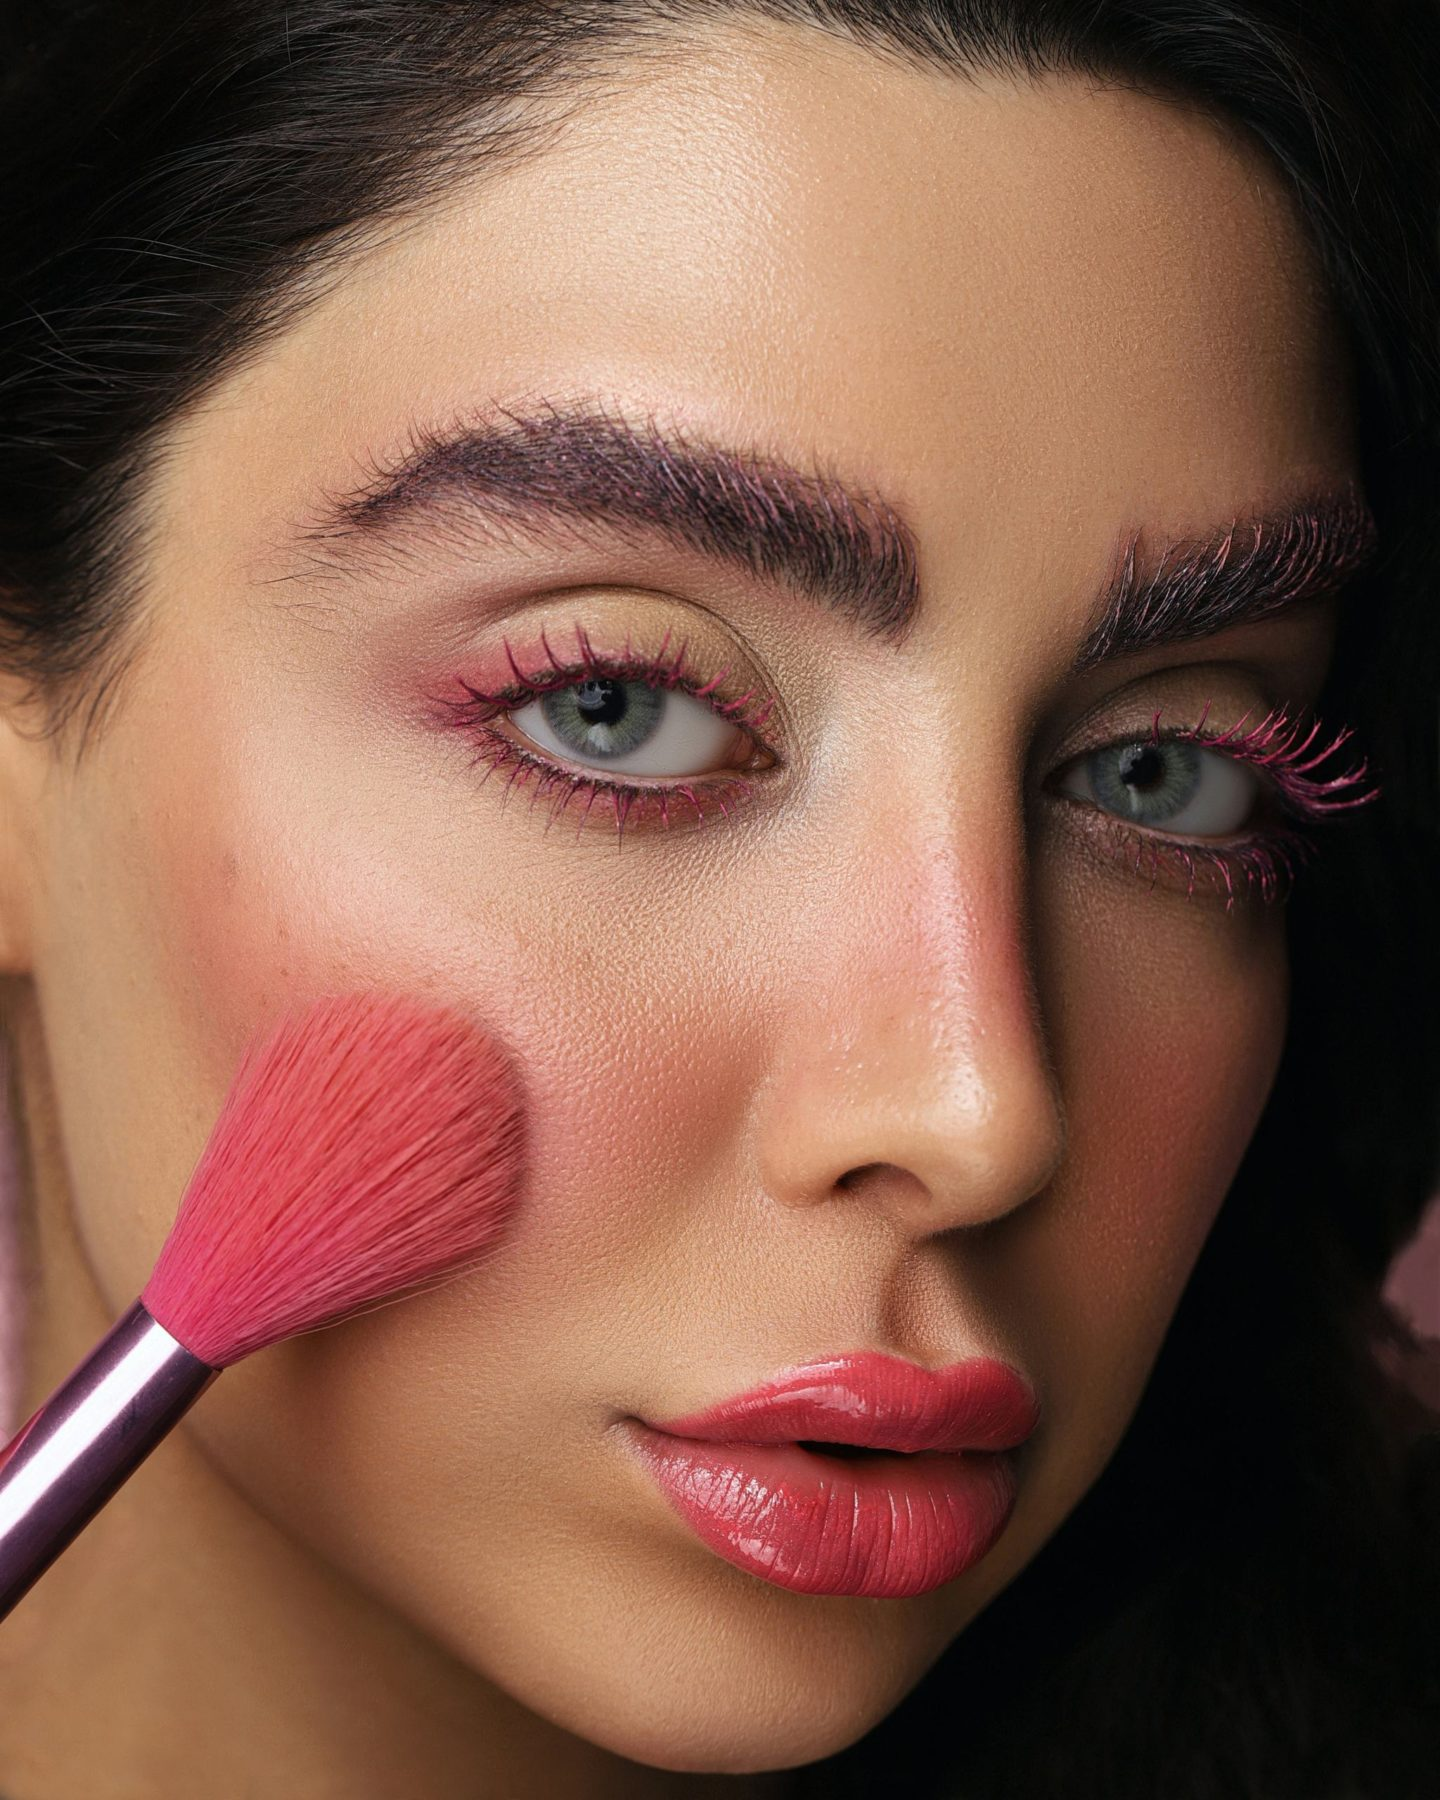 Masque, identité et maquillage.